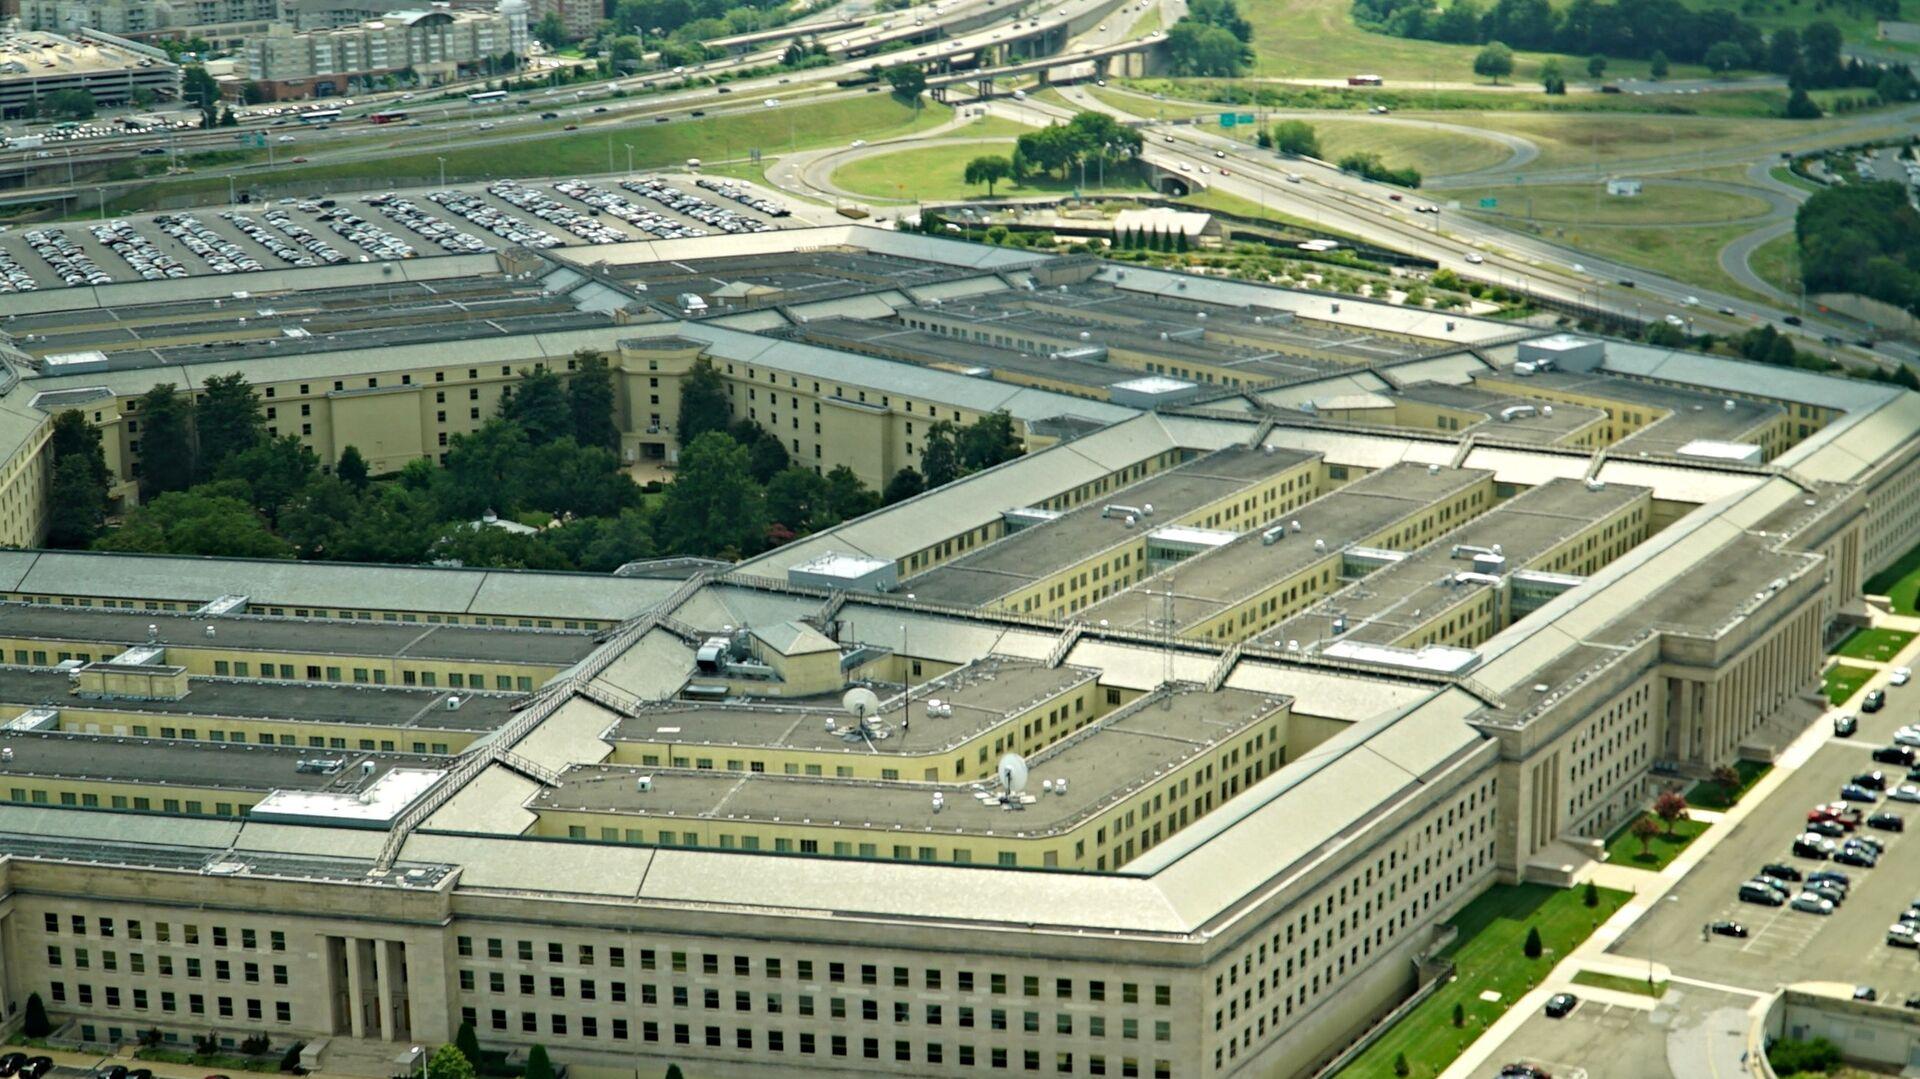 Budynek Pentagonu w amerykańskim okręgu Arlington - Sputnik Polska, 1920, 02.07.2021